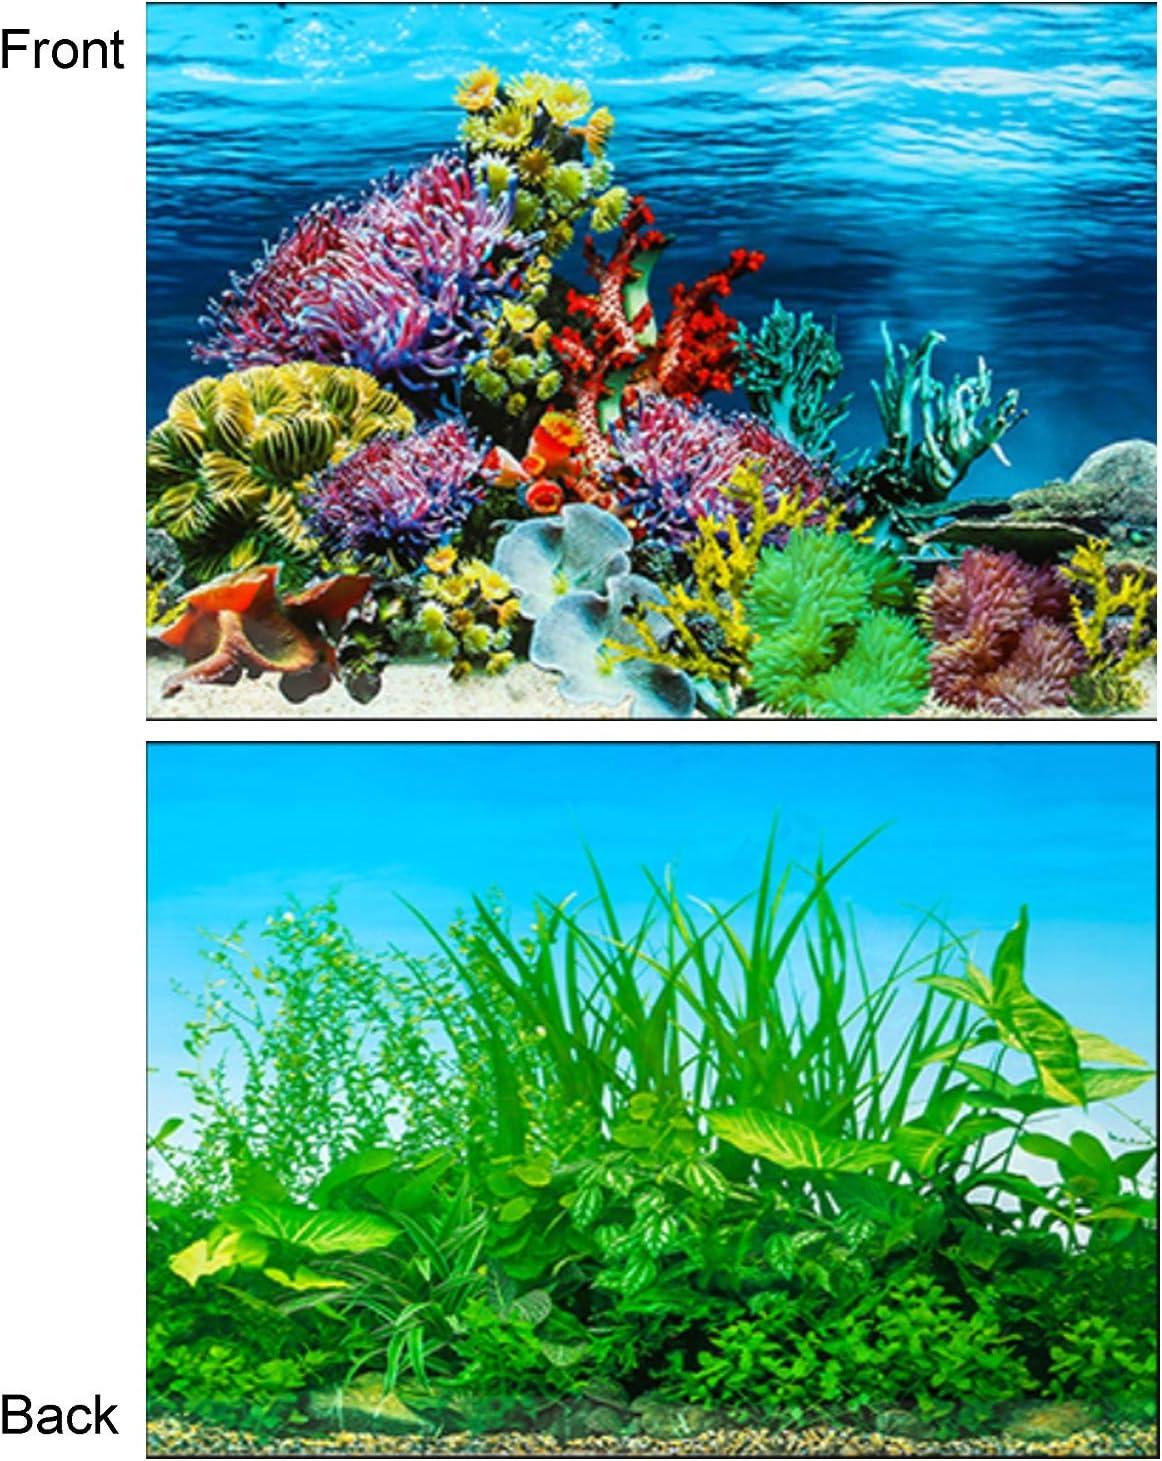 Amazon Com Azlzm Double Sides Fish Tank Background Aquarium Wallpaper Water Plants Coral Reef Poster 60x122cm Home Kitchen